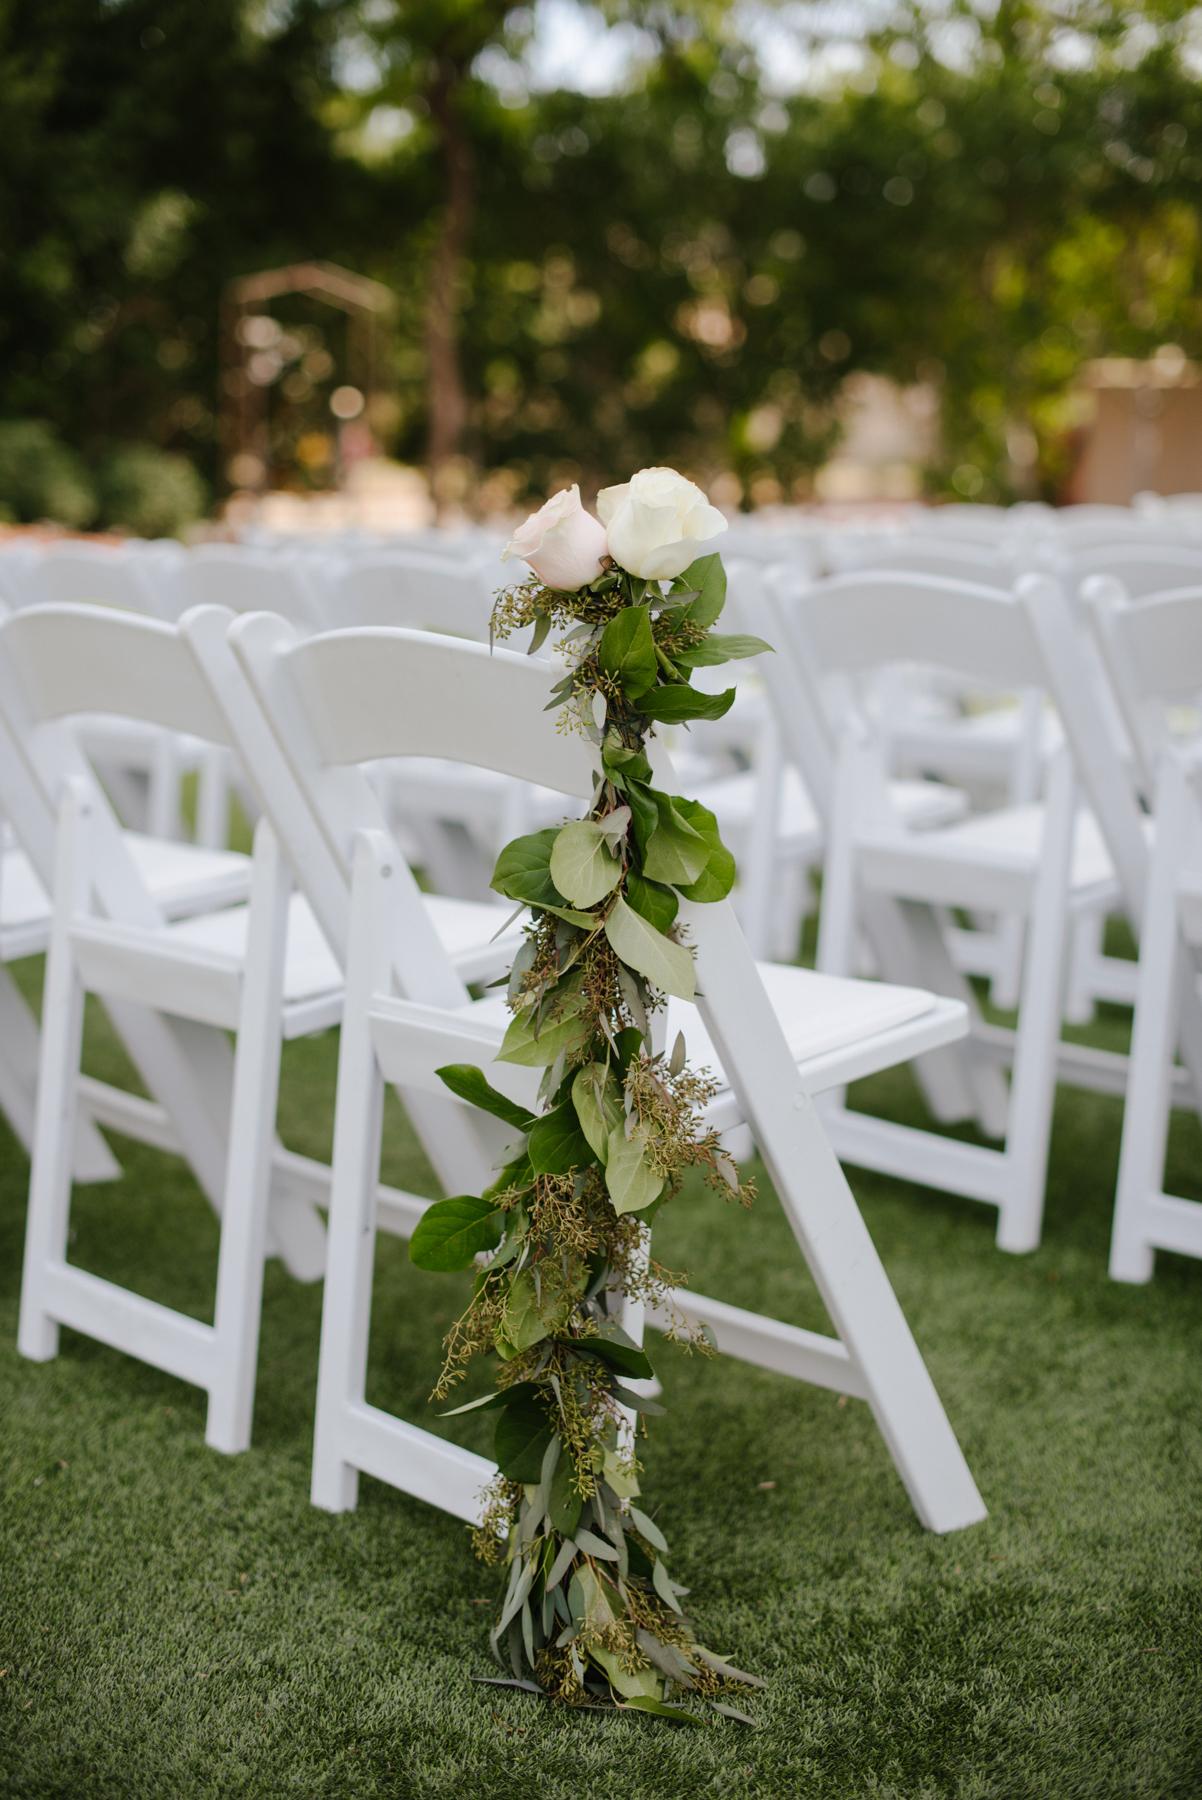 Secret Garden Event Center Wedding - Meredith Amadee Photography-29.jpg